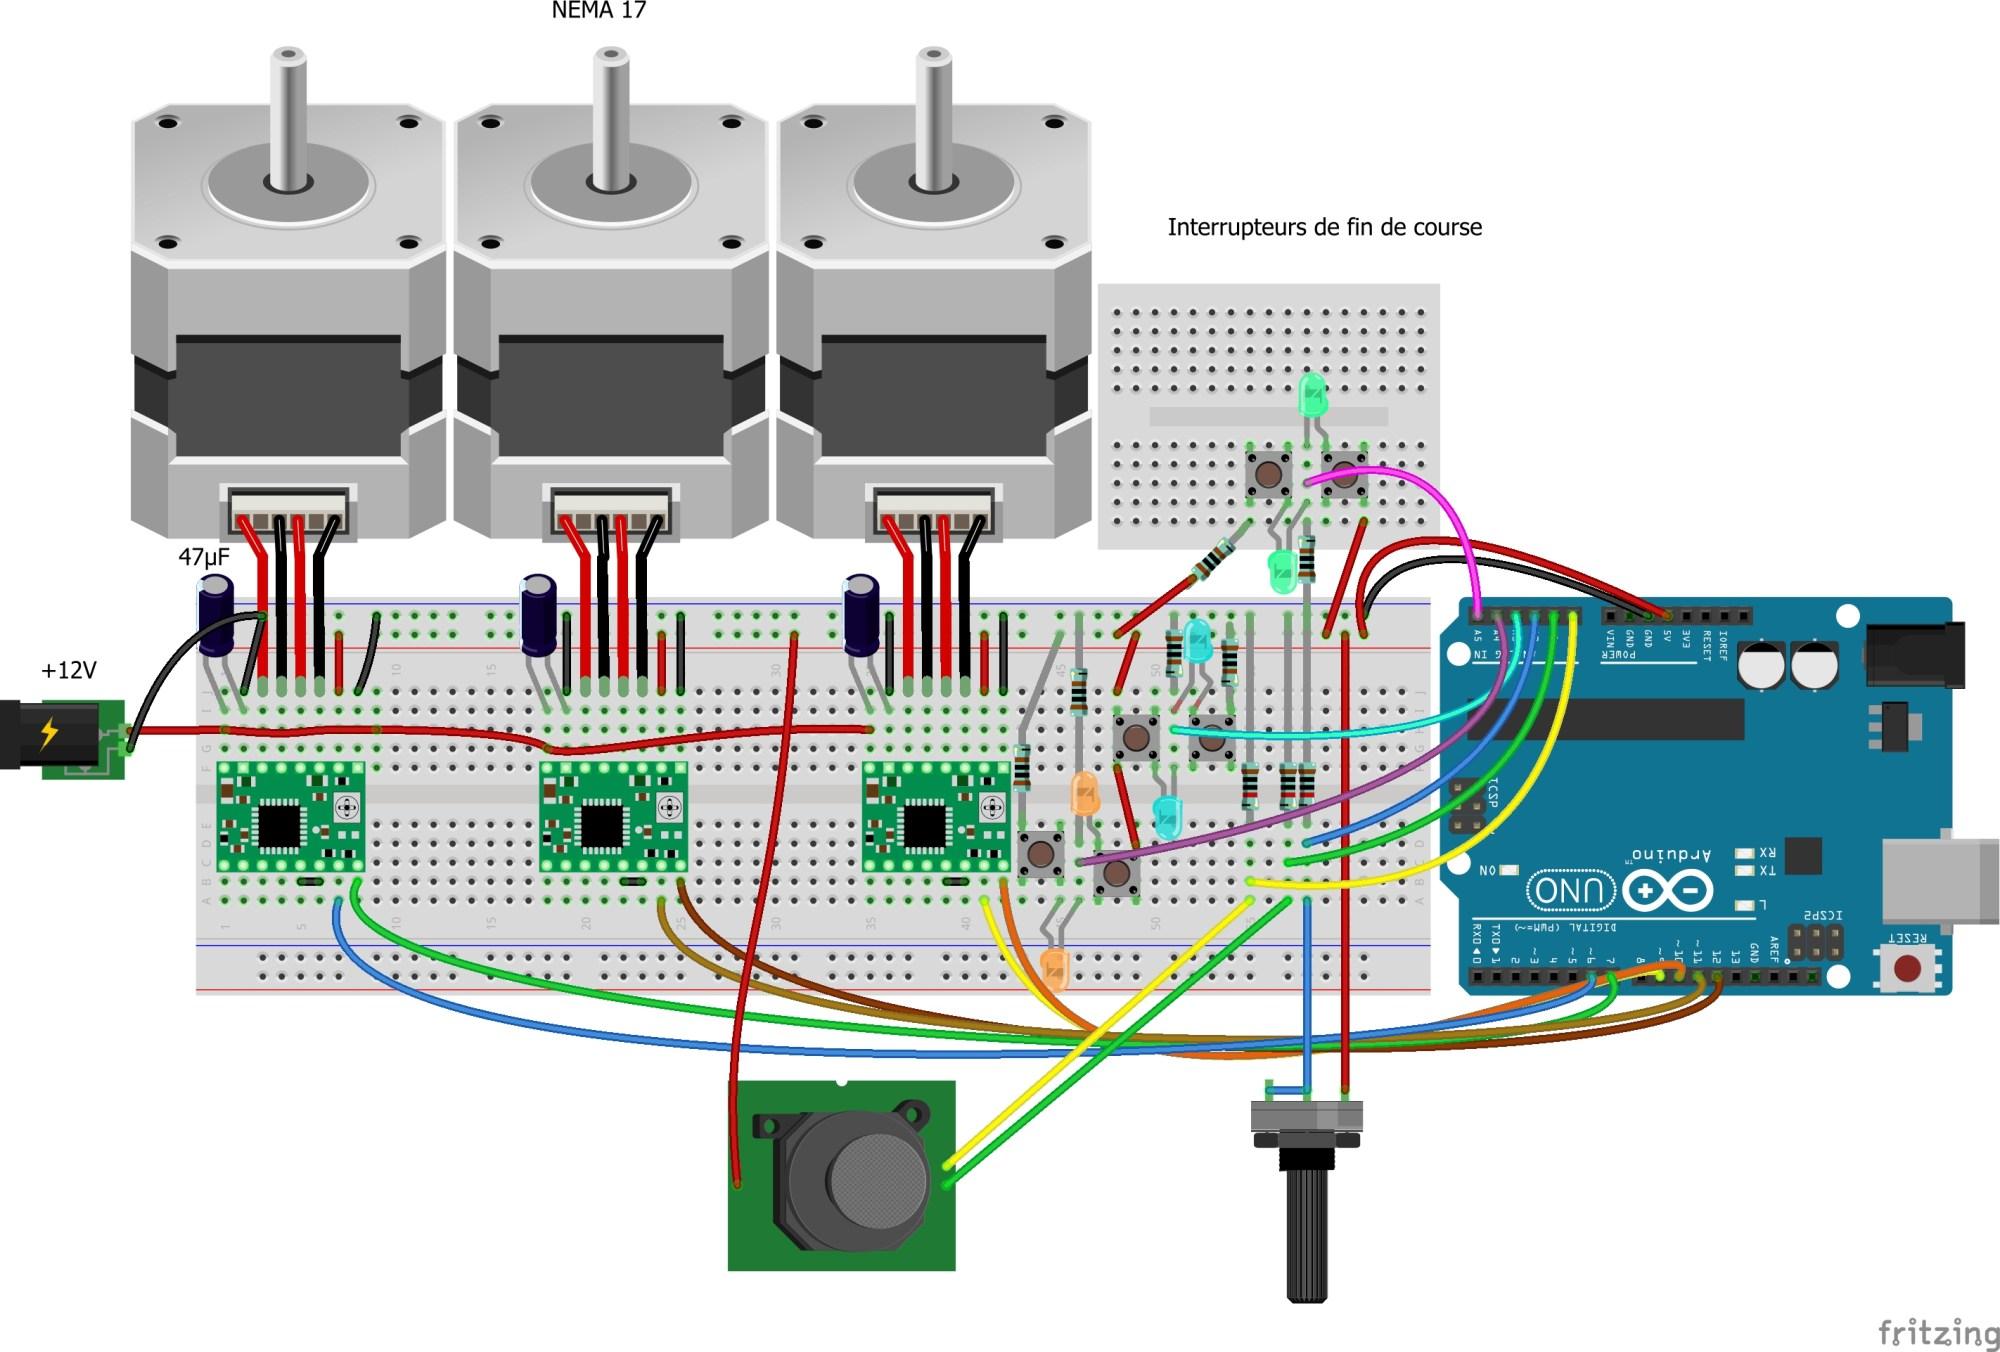 hight resolution of nema 17 wiring diagram cnc wiring library nema 17 wiring diagram abb a cnc fritz